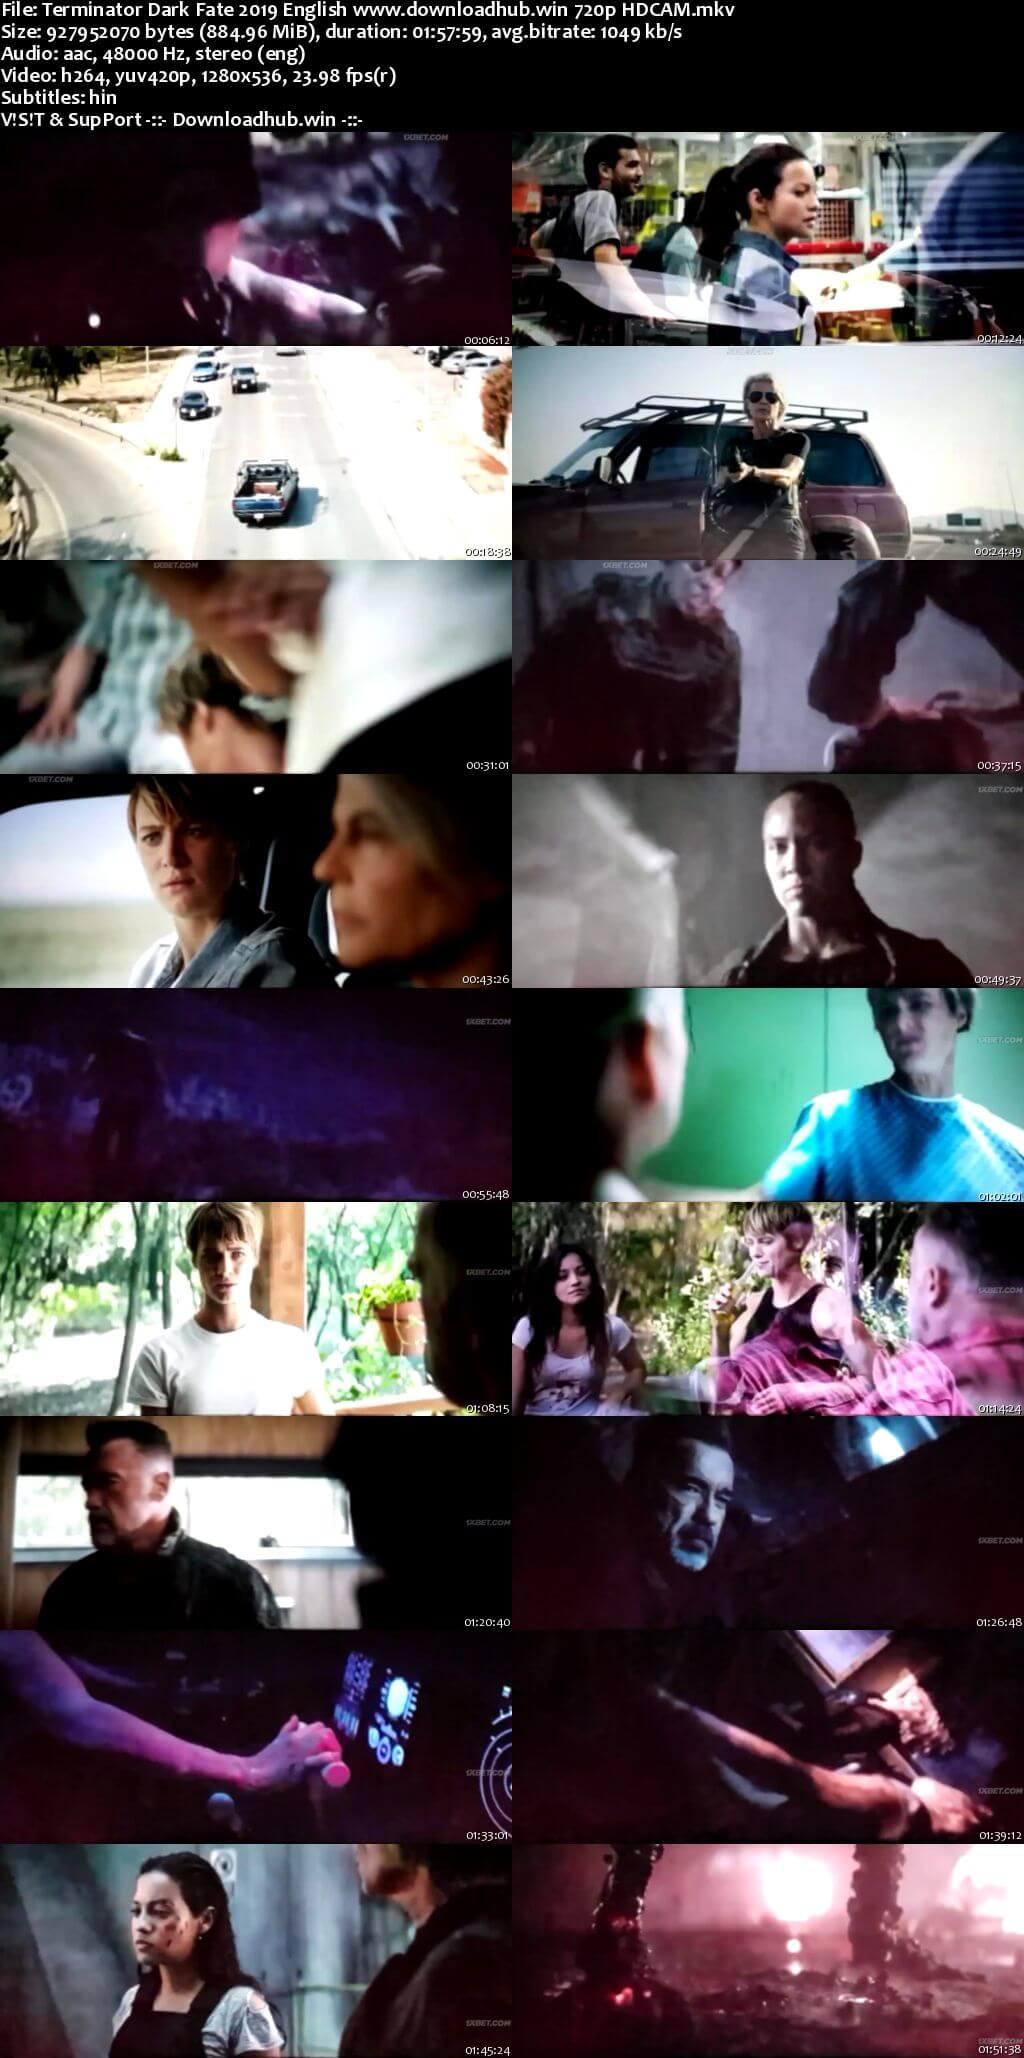 Terminator Dark Fate 2019 English 720p HDCAM Hindi Subs